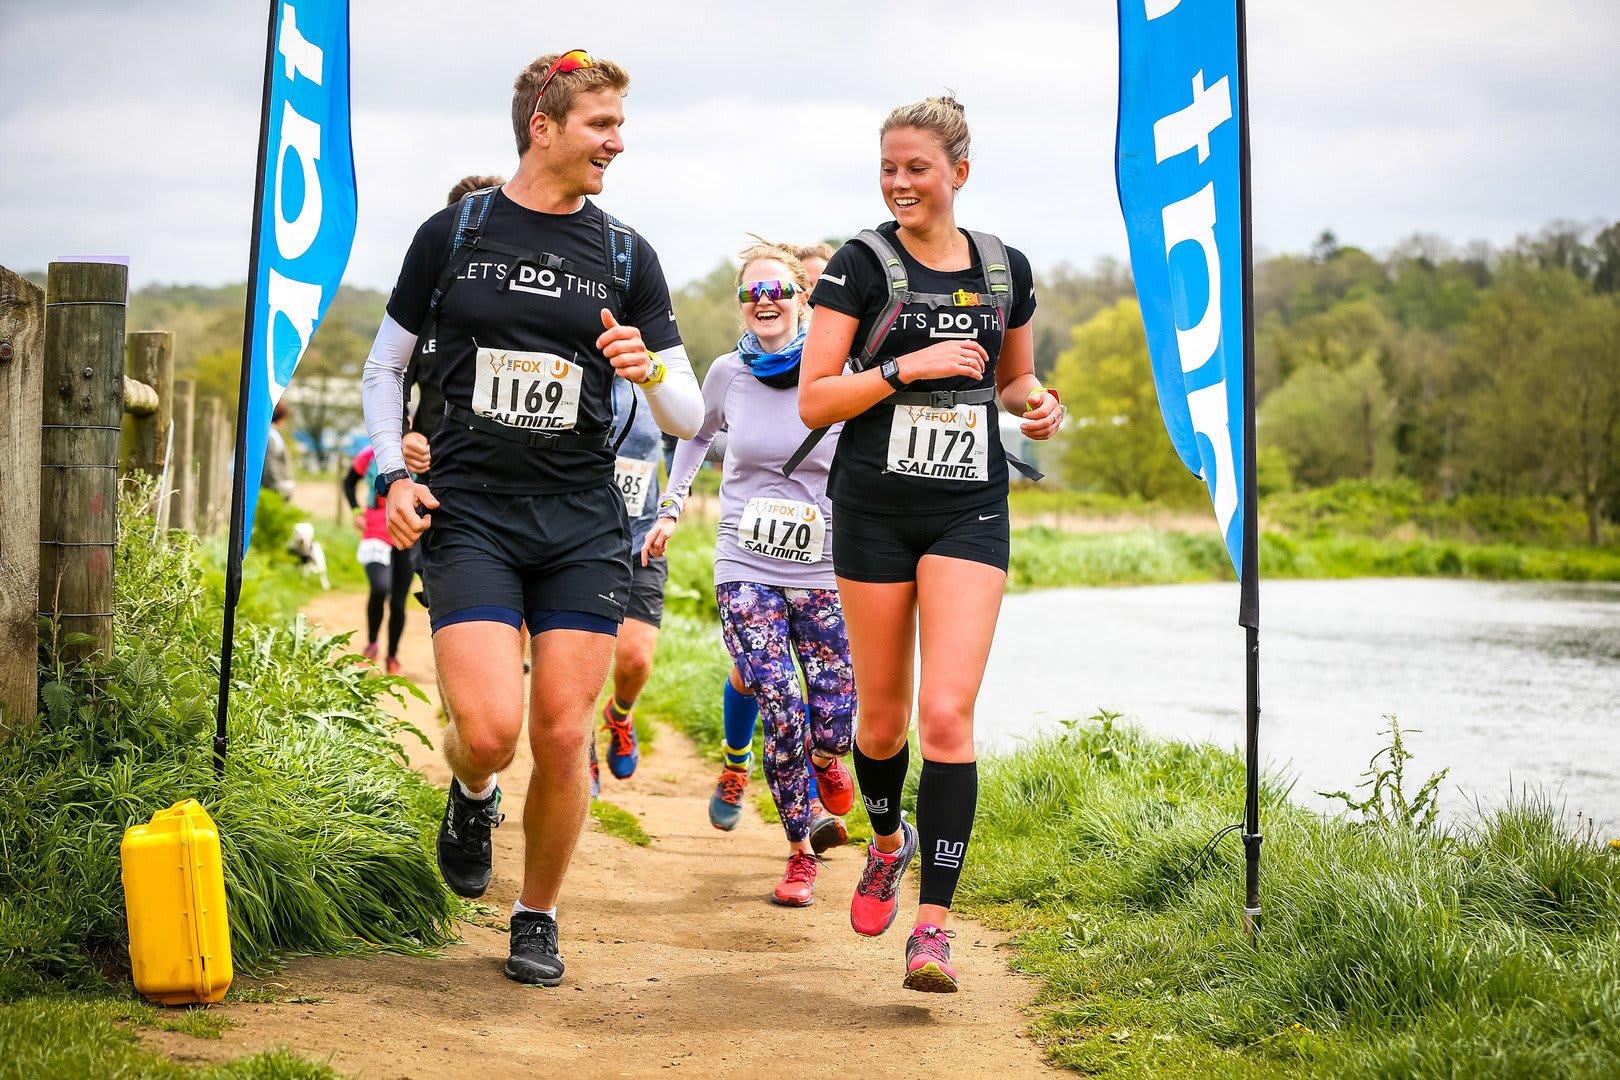 The Fox Ultra, Marathon & Half Marathon - April